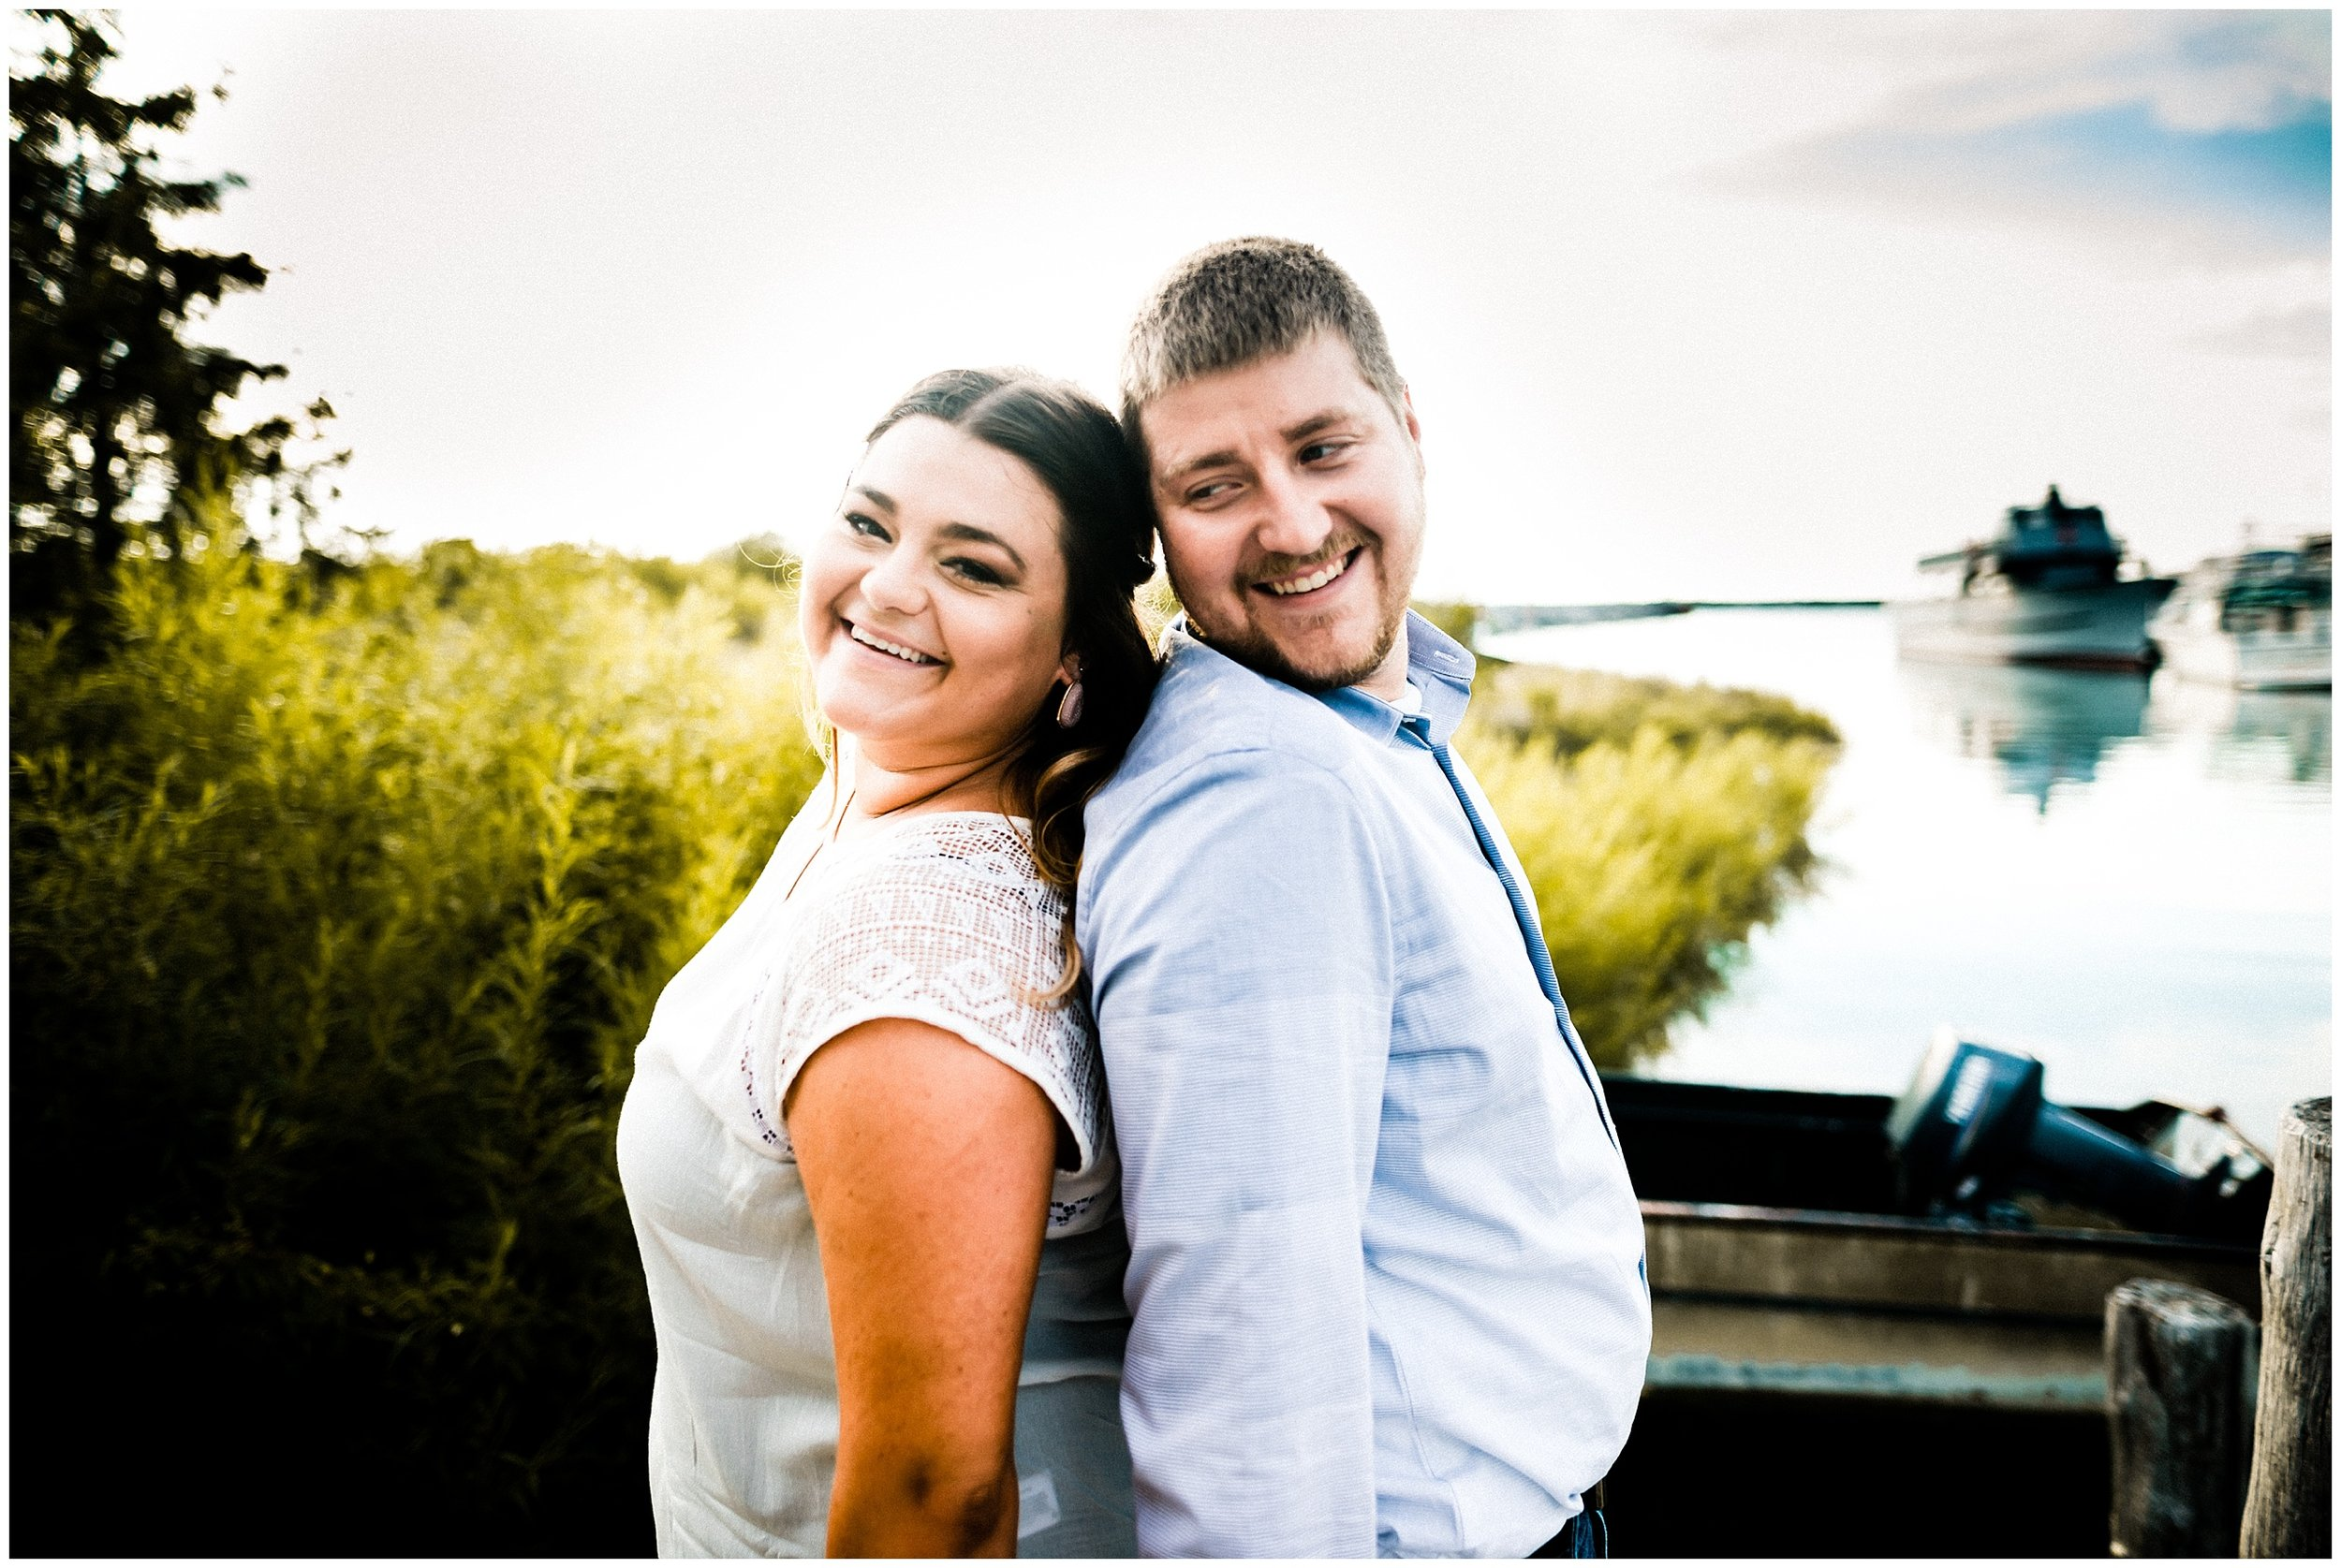 Kyle + Emily | Engaged #kyleepaigephotography_0498.jpg